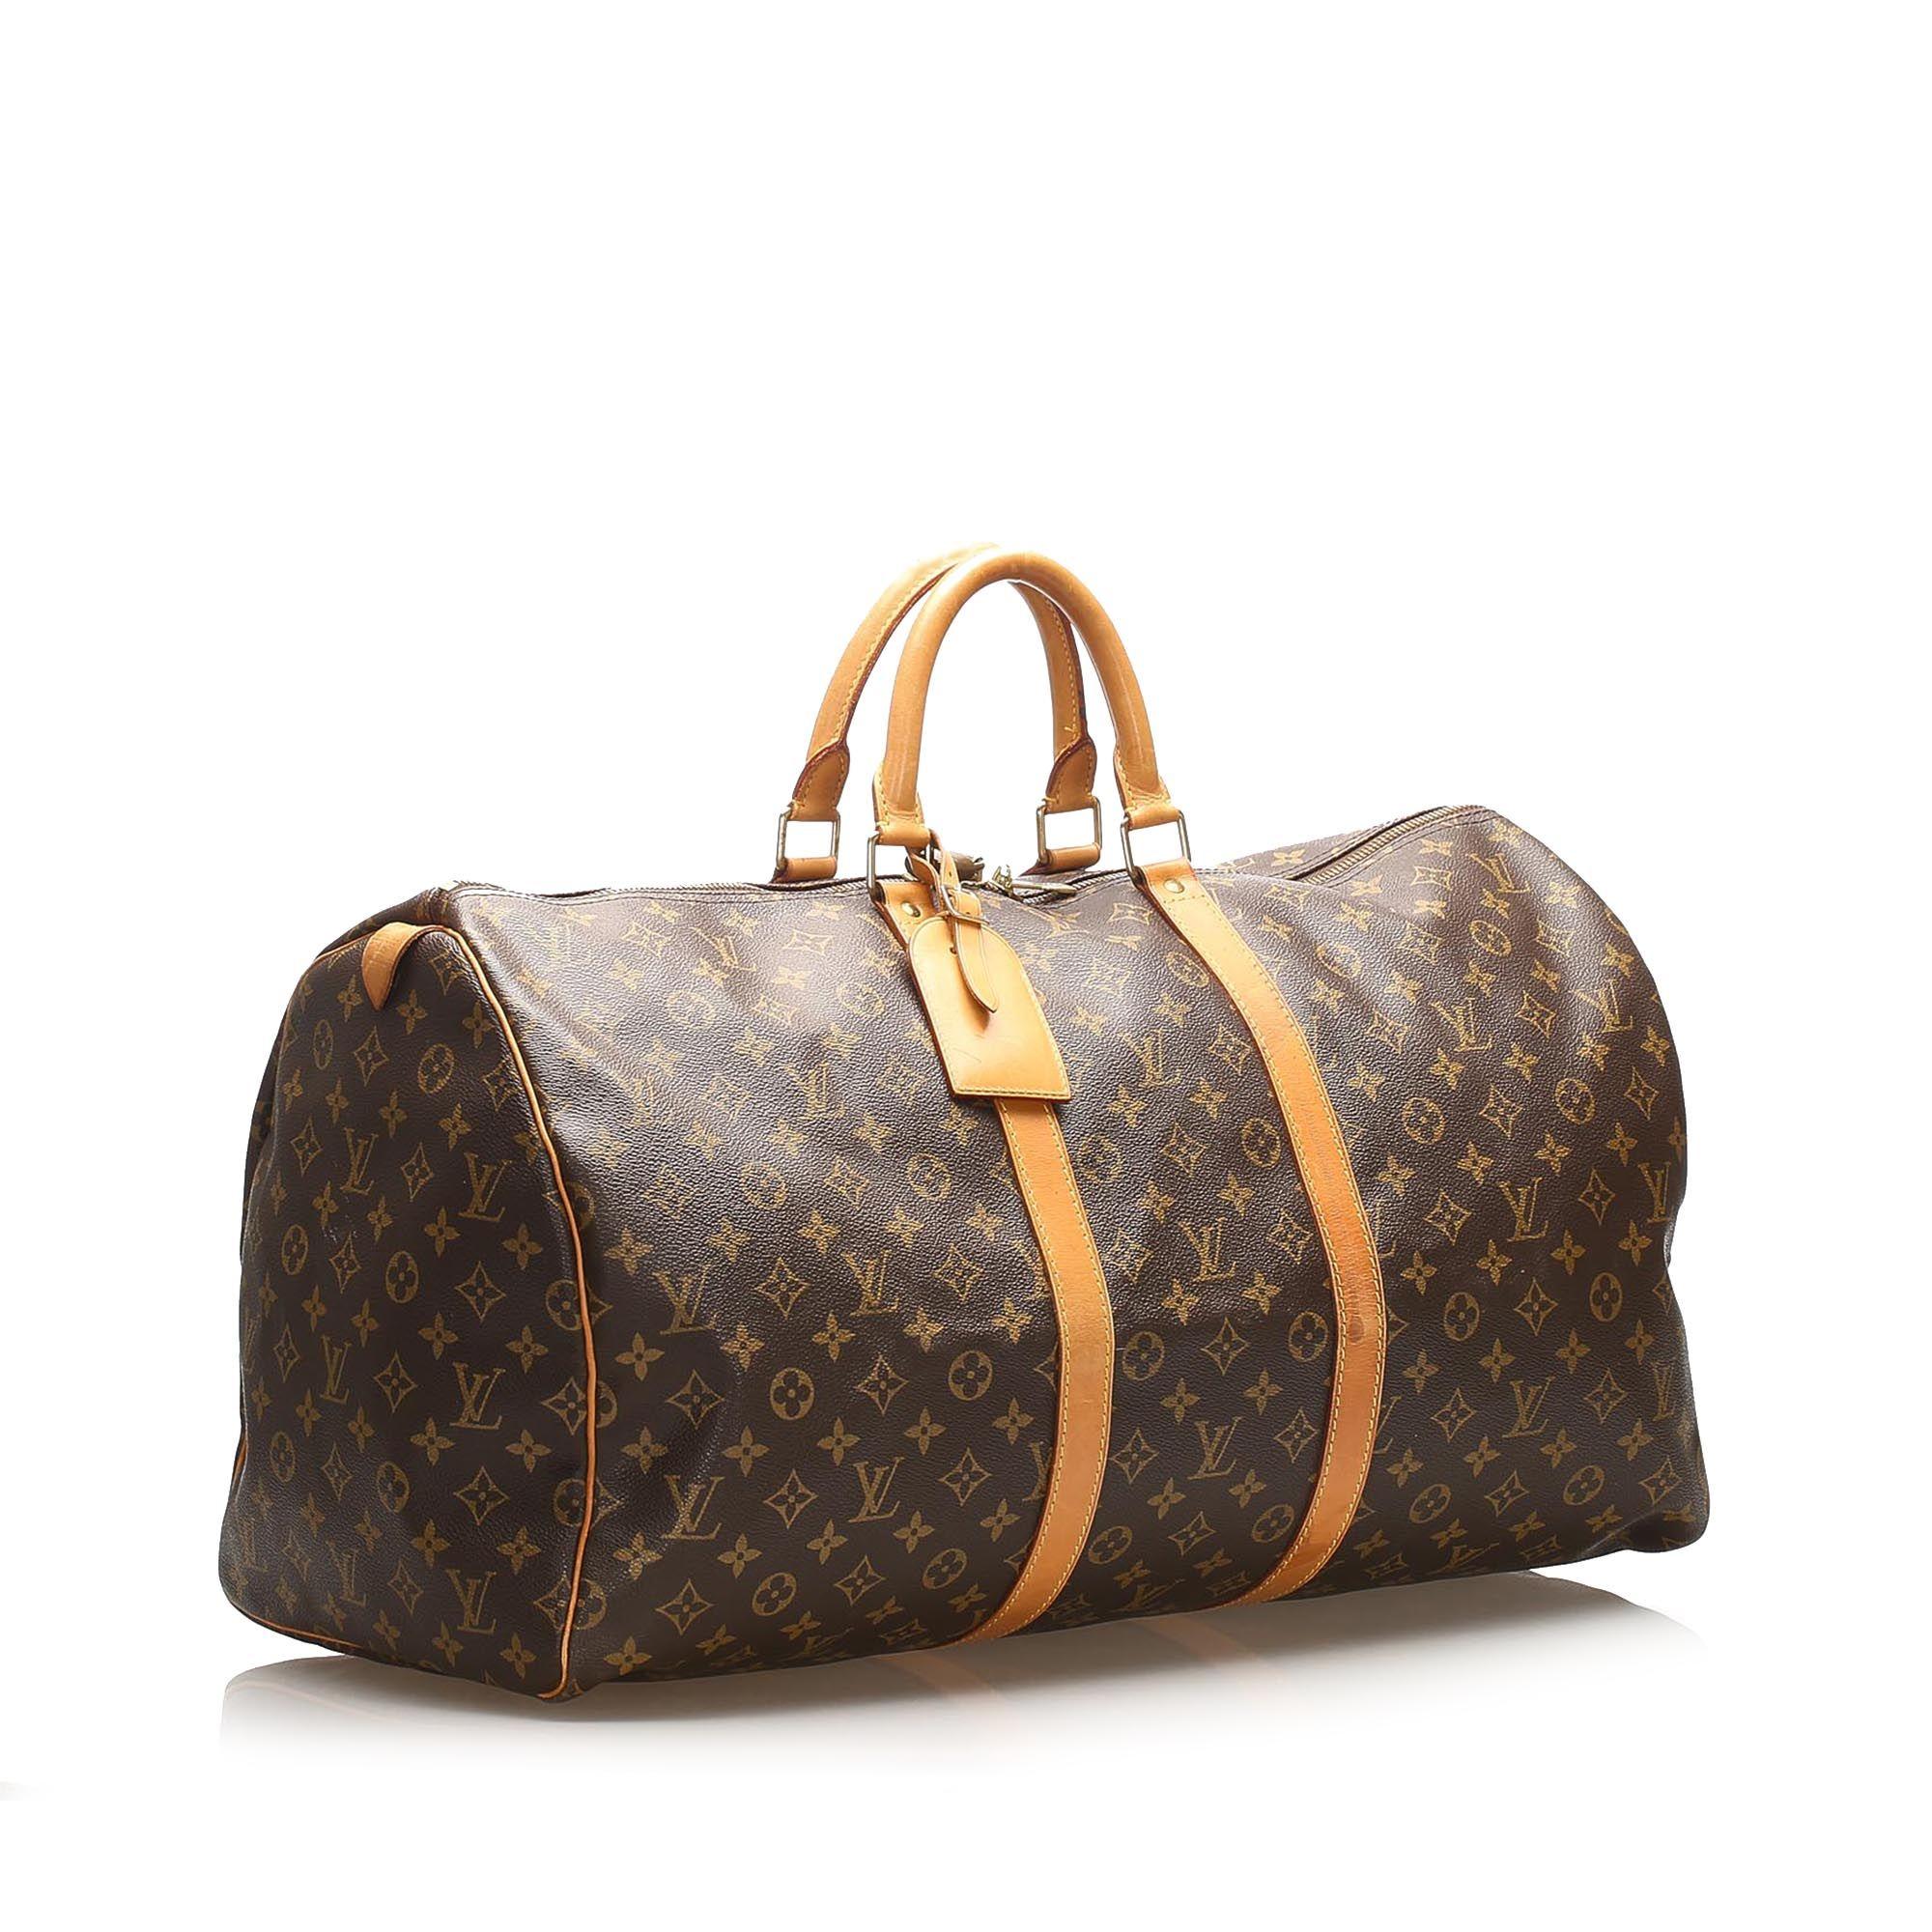 Vintage Louis Vuitton Monogram Keepall Bandouliere 60 Brown